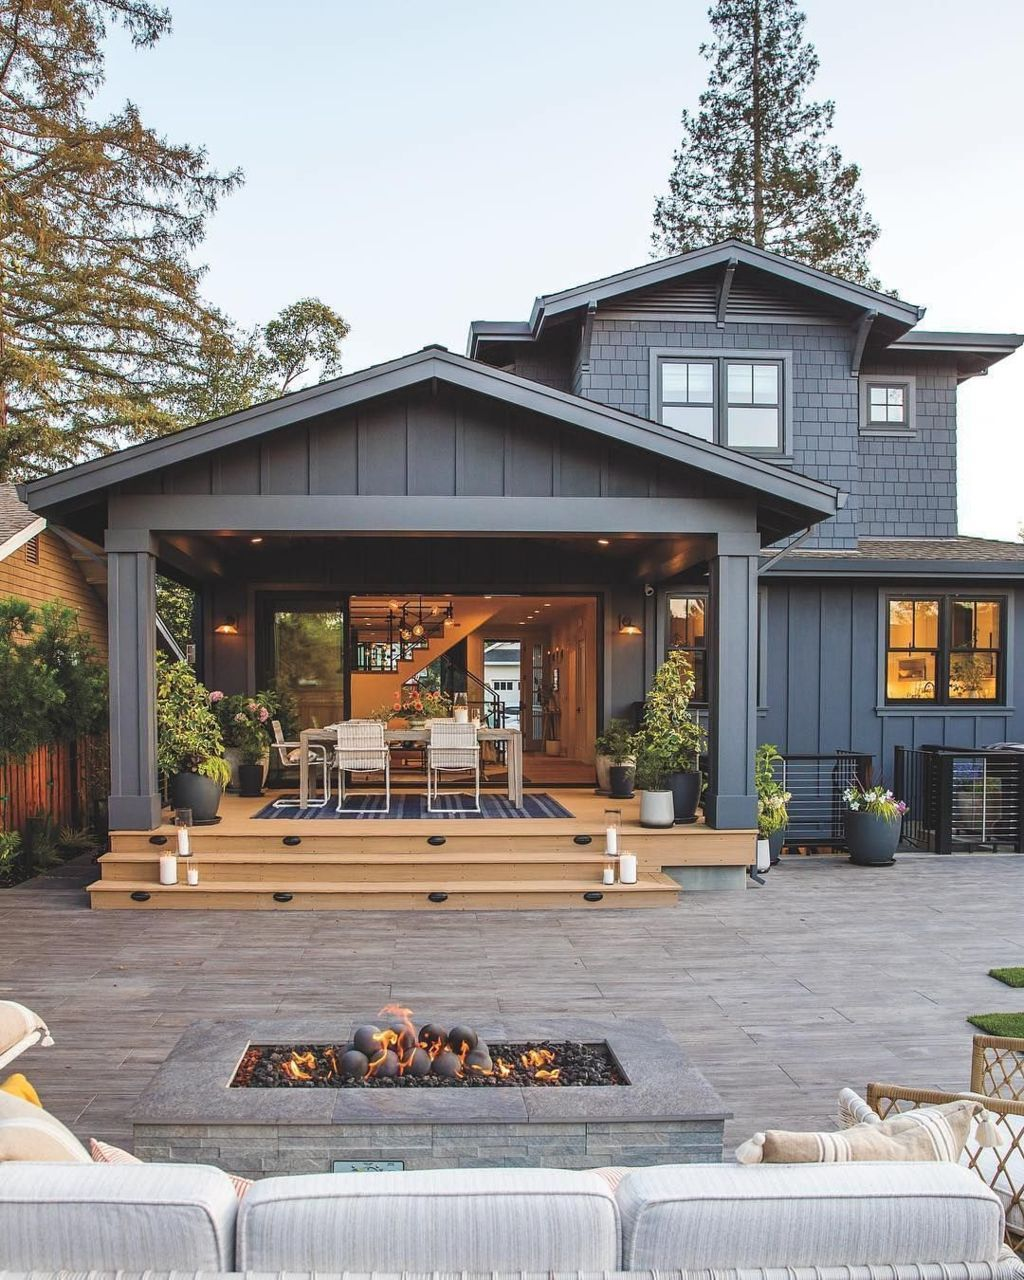 30 Back Porch Designs Perfect For Everything Shairoom Com House Exterior Back Porch Designs Craftsman House